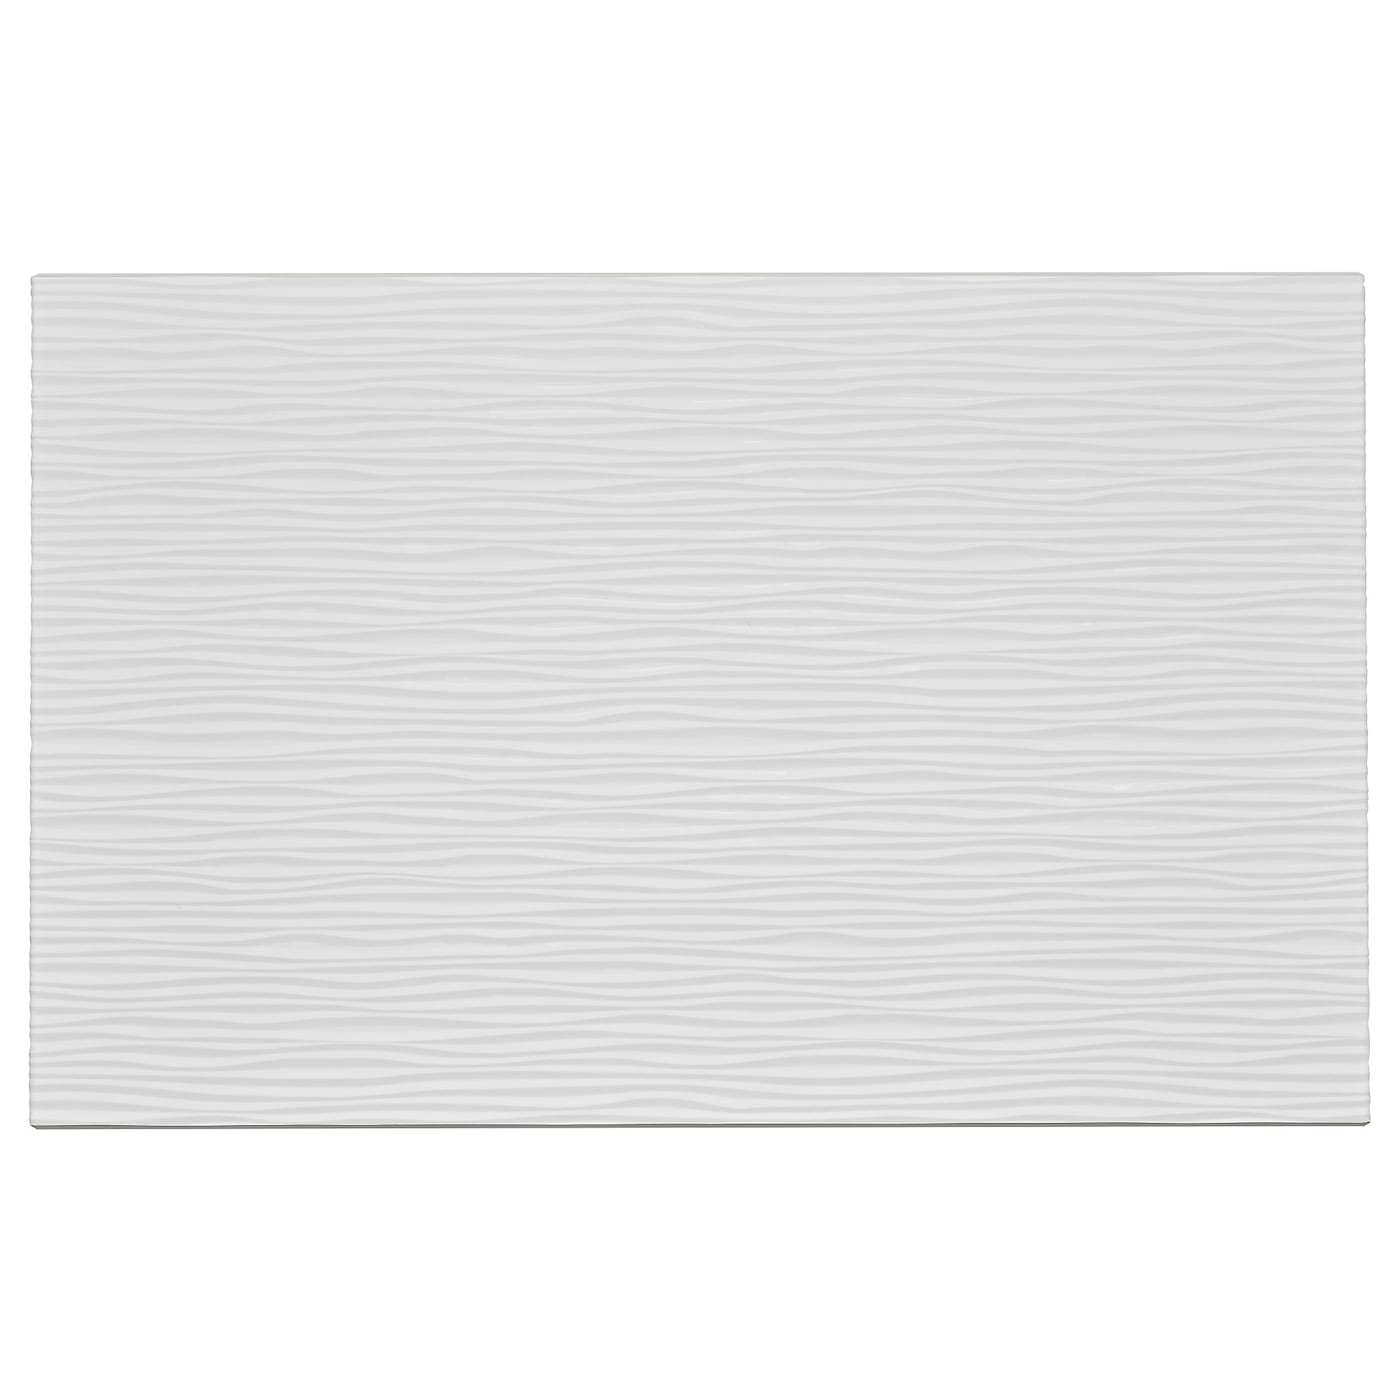 Puerta/frente de caj�n, blanco, 60x38 cm